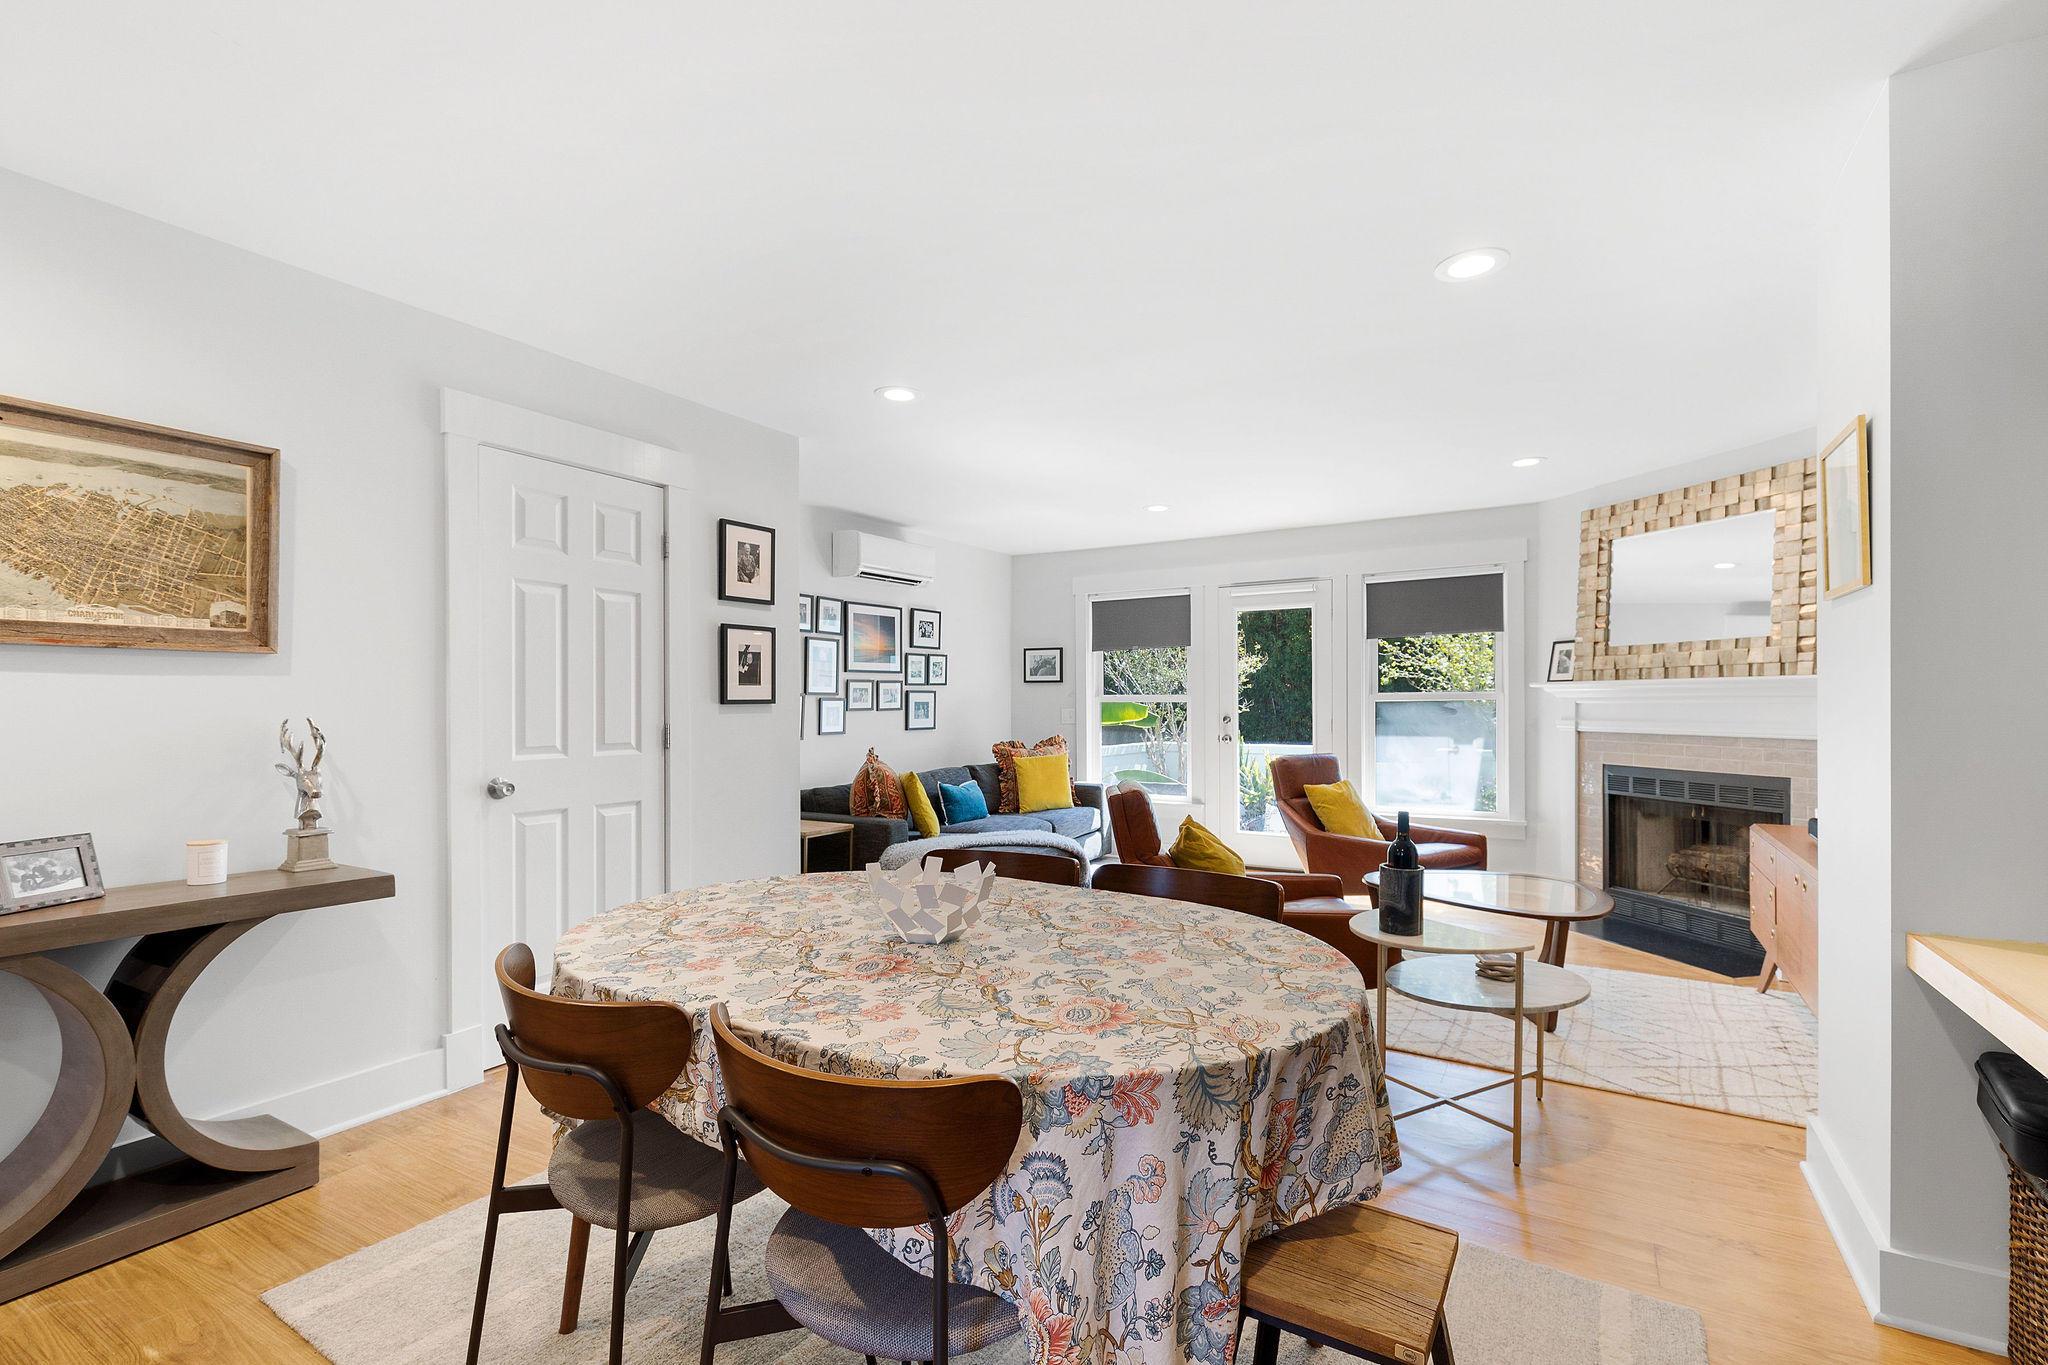 Proprietors Row Homes For Sale - 824 Colony, Charleston, SC - 11